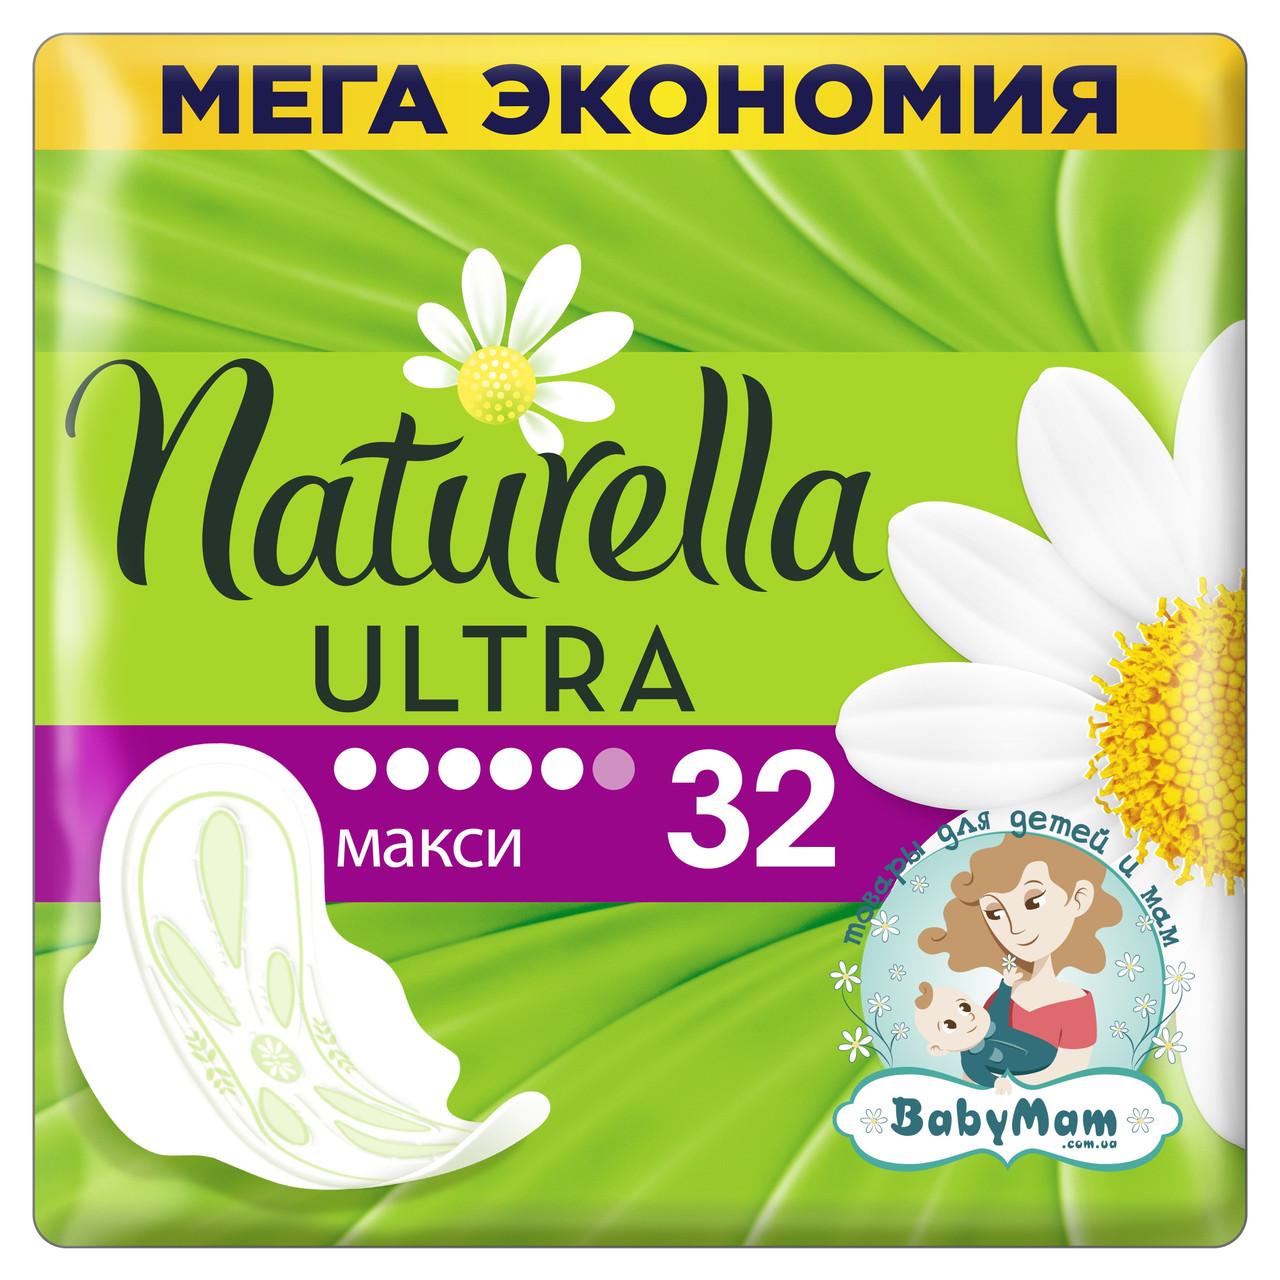 Гигиенические прокладки Naturella Ultra Camomile Maxi Quatro, 32шт